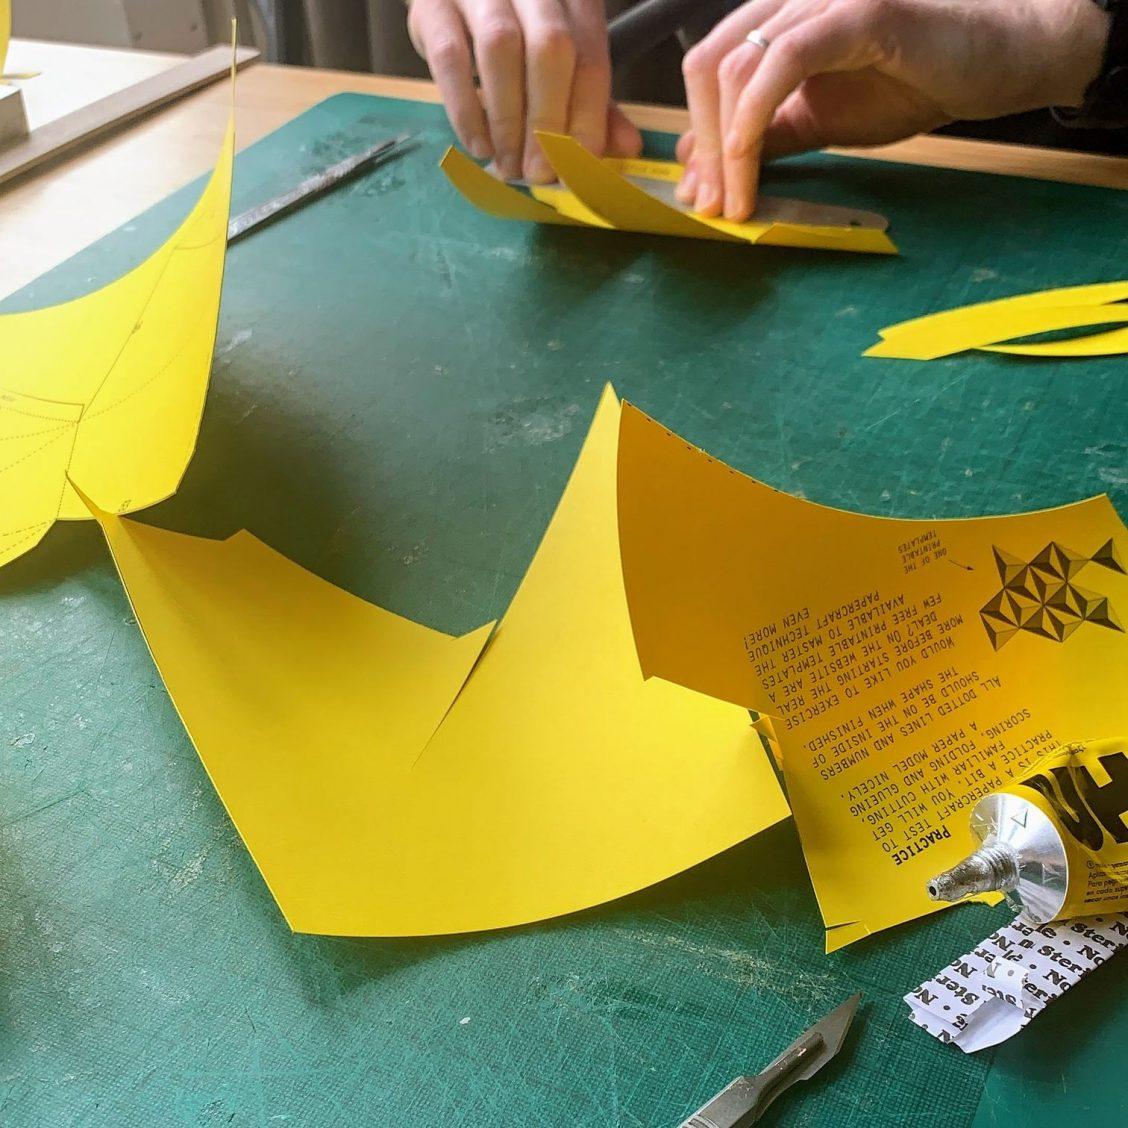 Me working on the paper rhino